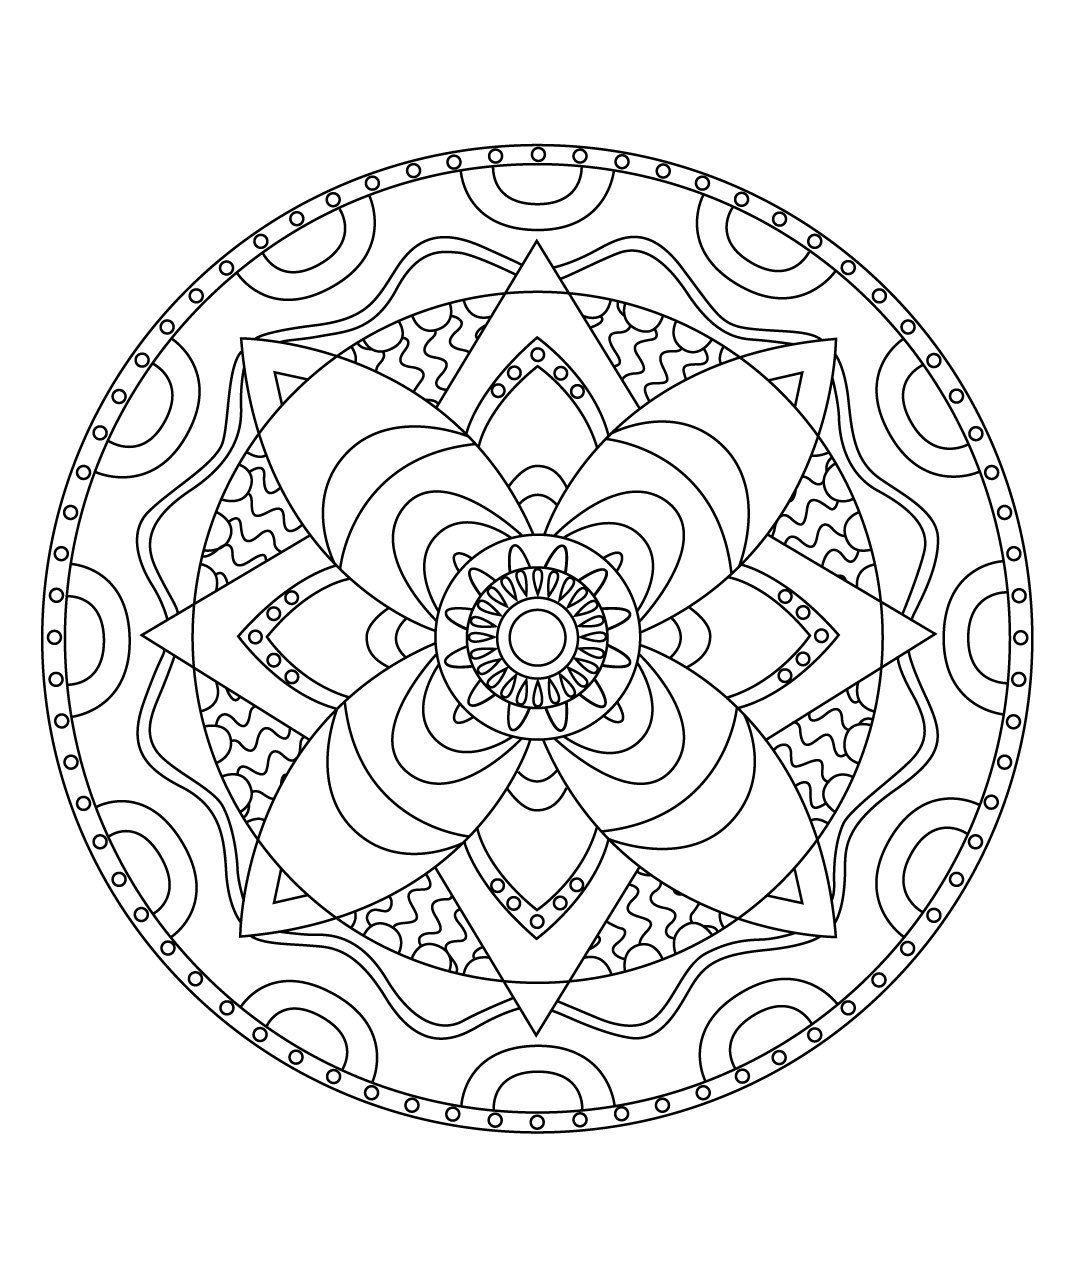 Coloriage mandala garcon dessin - Coloriage mandale ...